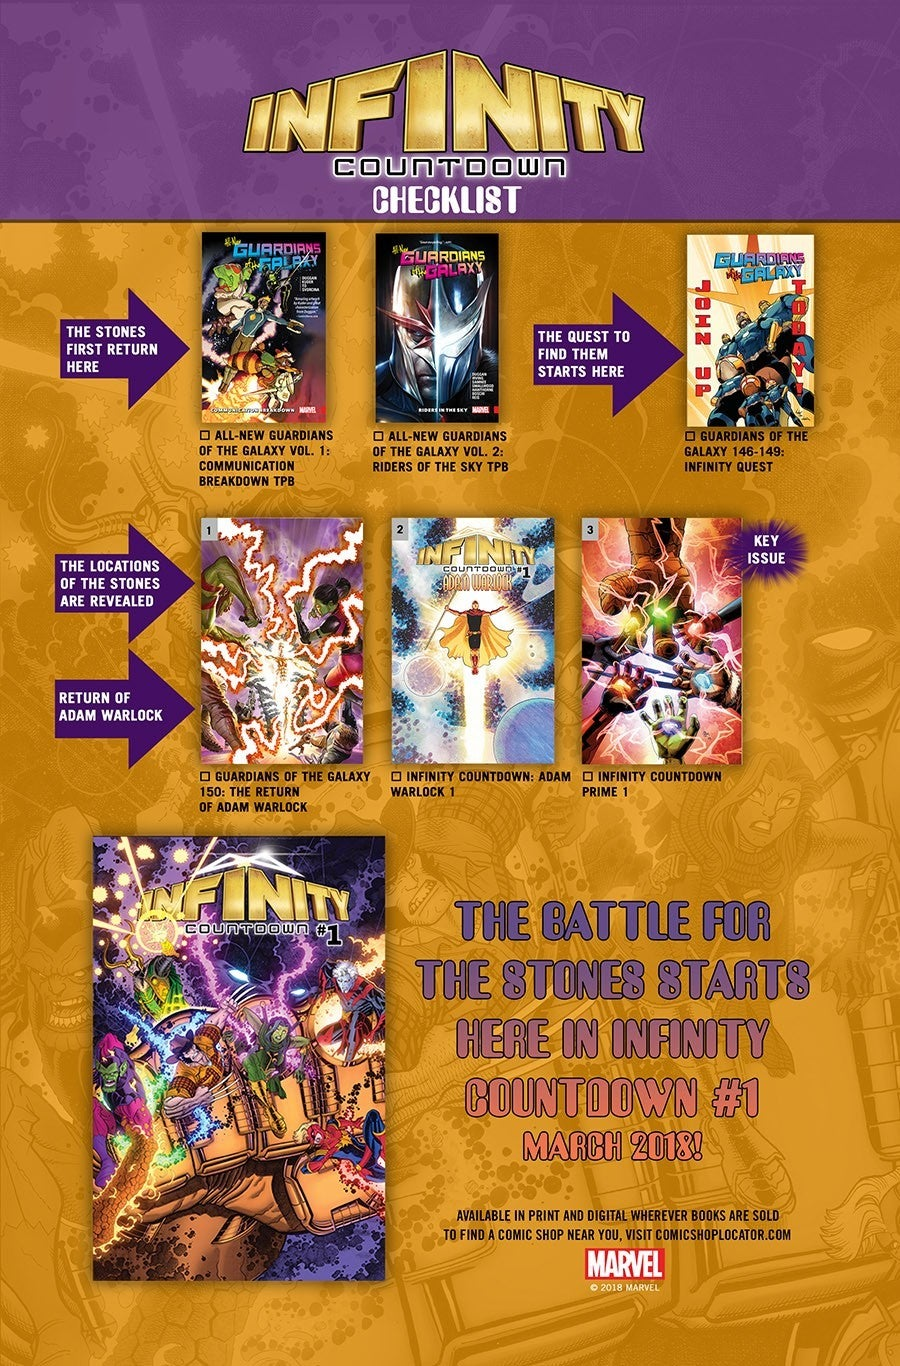 Infinity_Countdown_Checklist